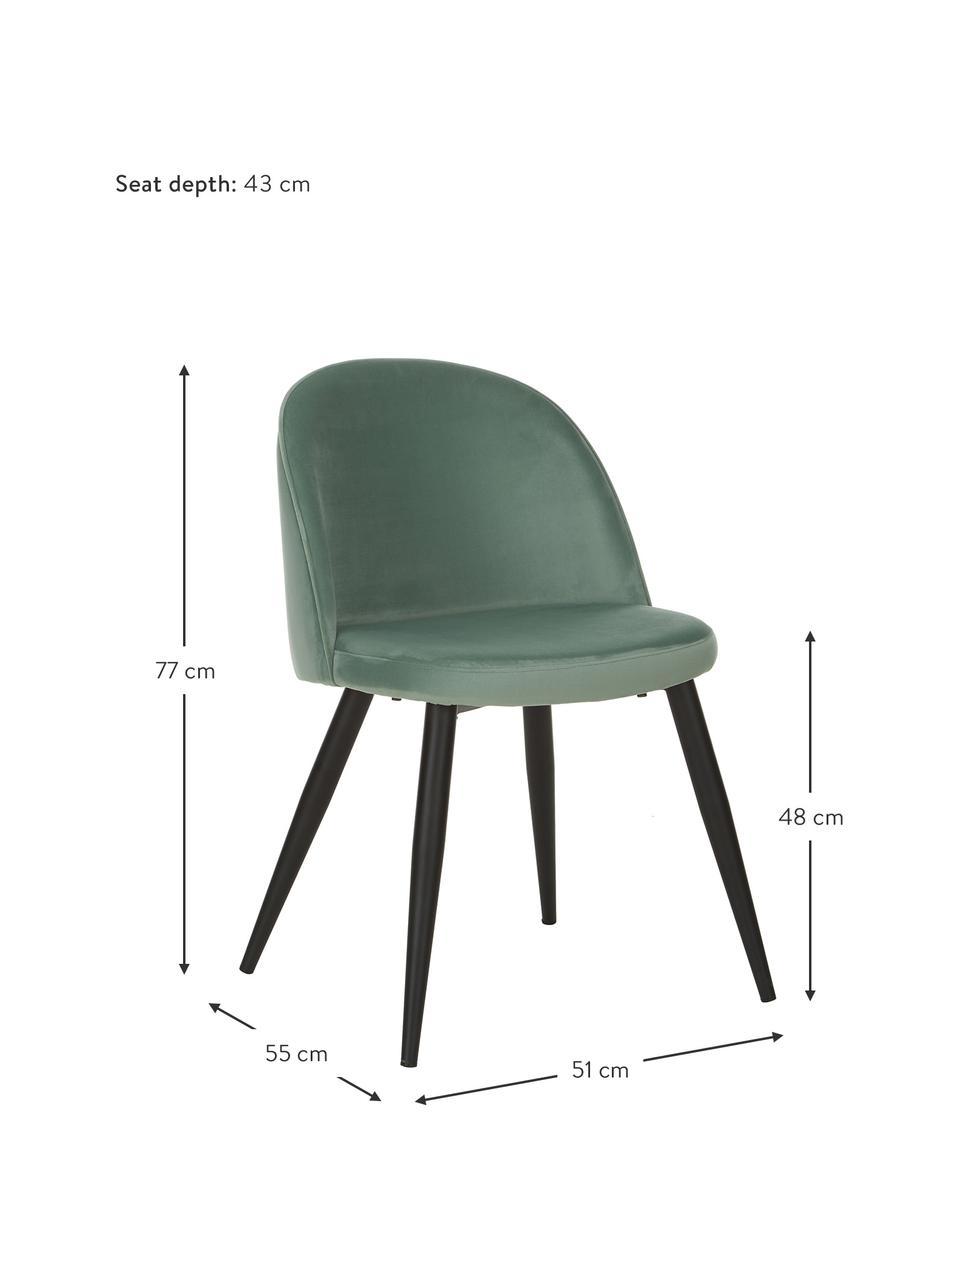 Moderne fluwelen stoelen Amy, 2 stuks, Bekleding: fluweel (polyester), Poten: gepoedercoat metaal, Turquoise, B 51 x D 55 cm